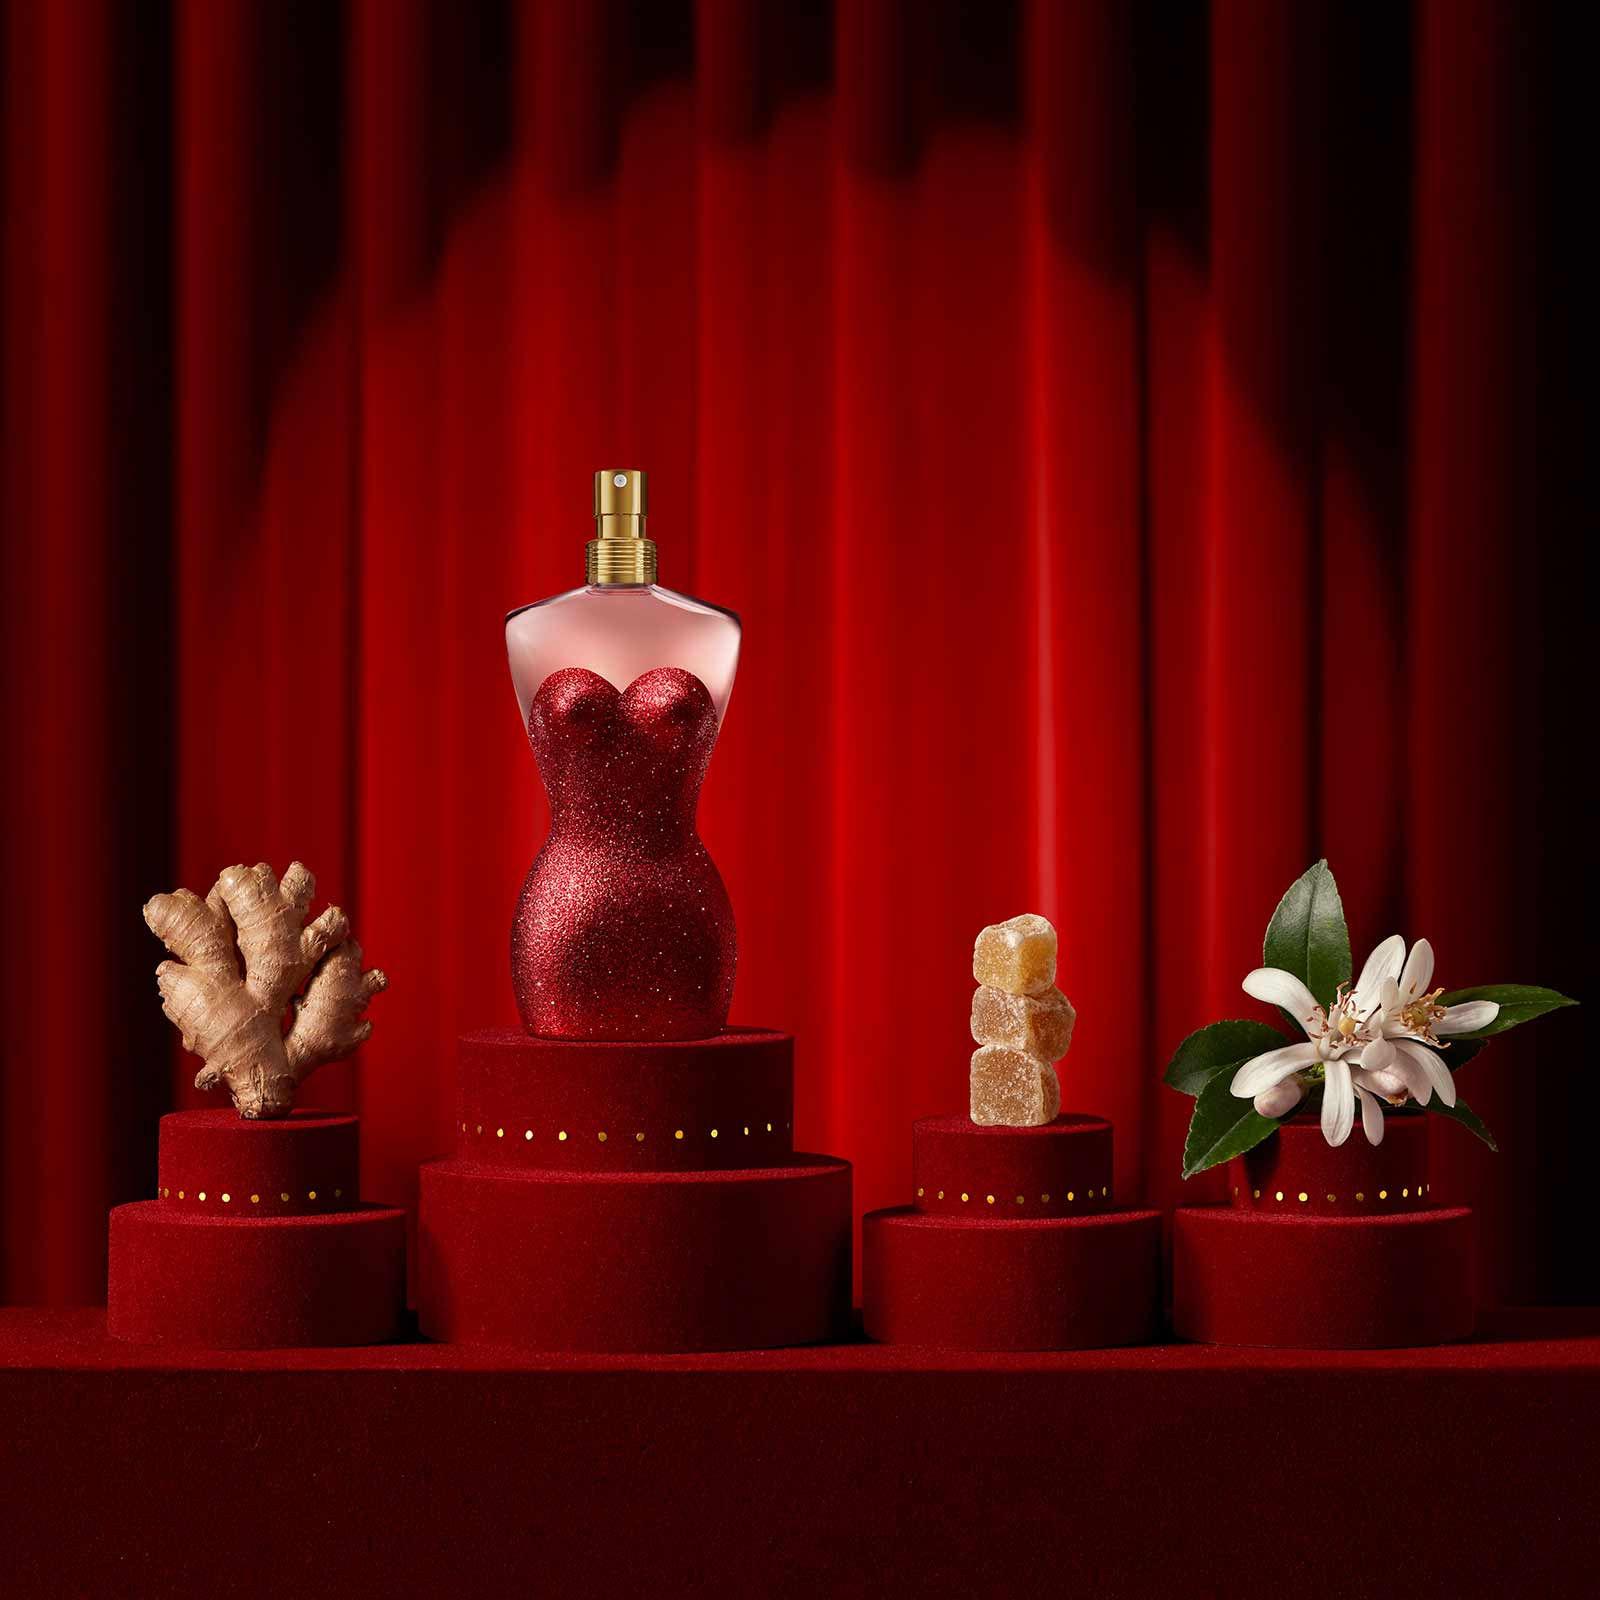 Buy Jean Paul Gaultier Classique Cabaret Eau De Parfum at Nykaa.com